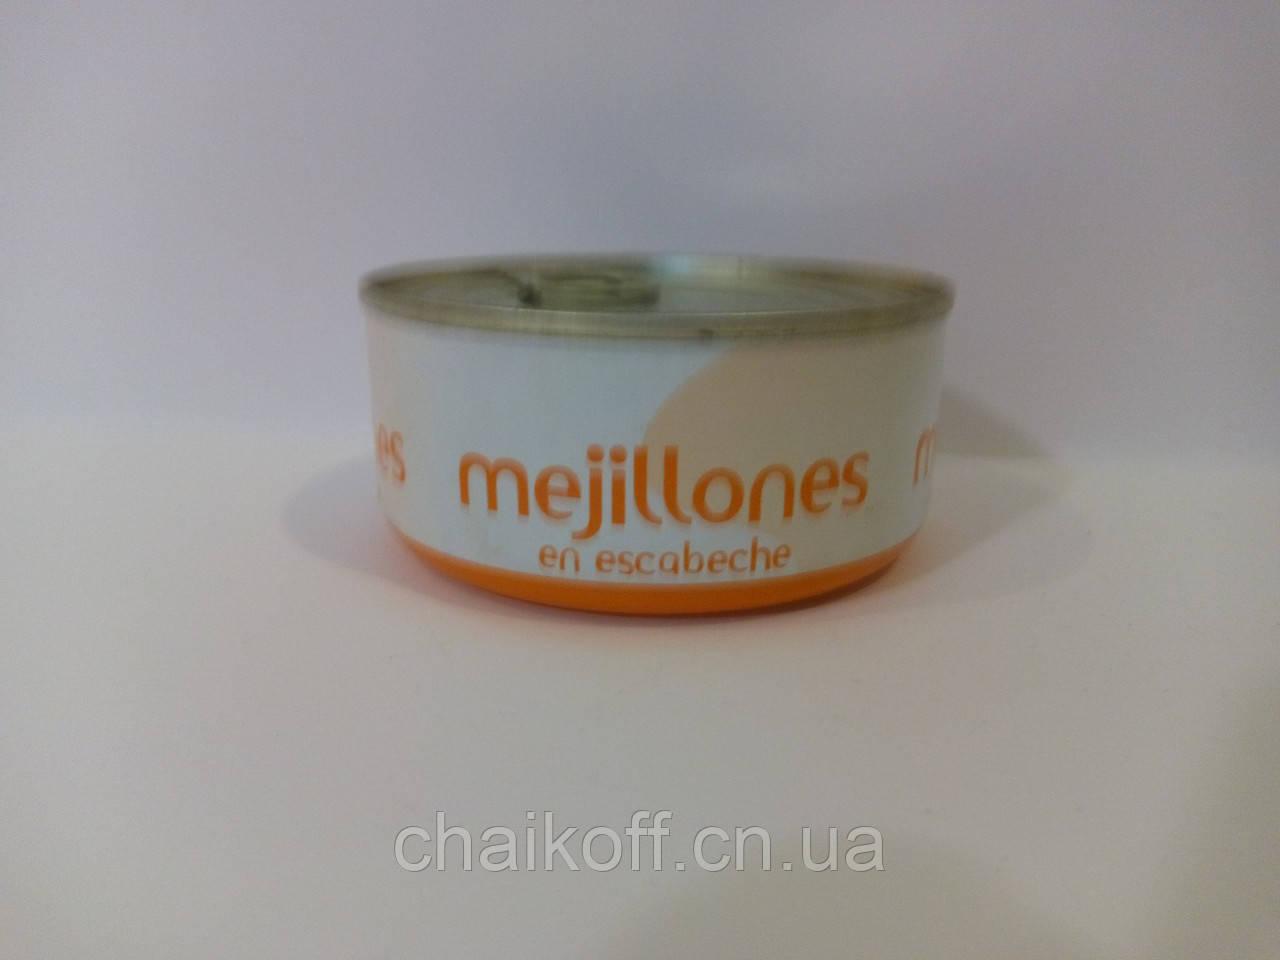 Мідії в олійно-томатному соусі Hacendado Mejillones en escabeche 175g (шт.)